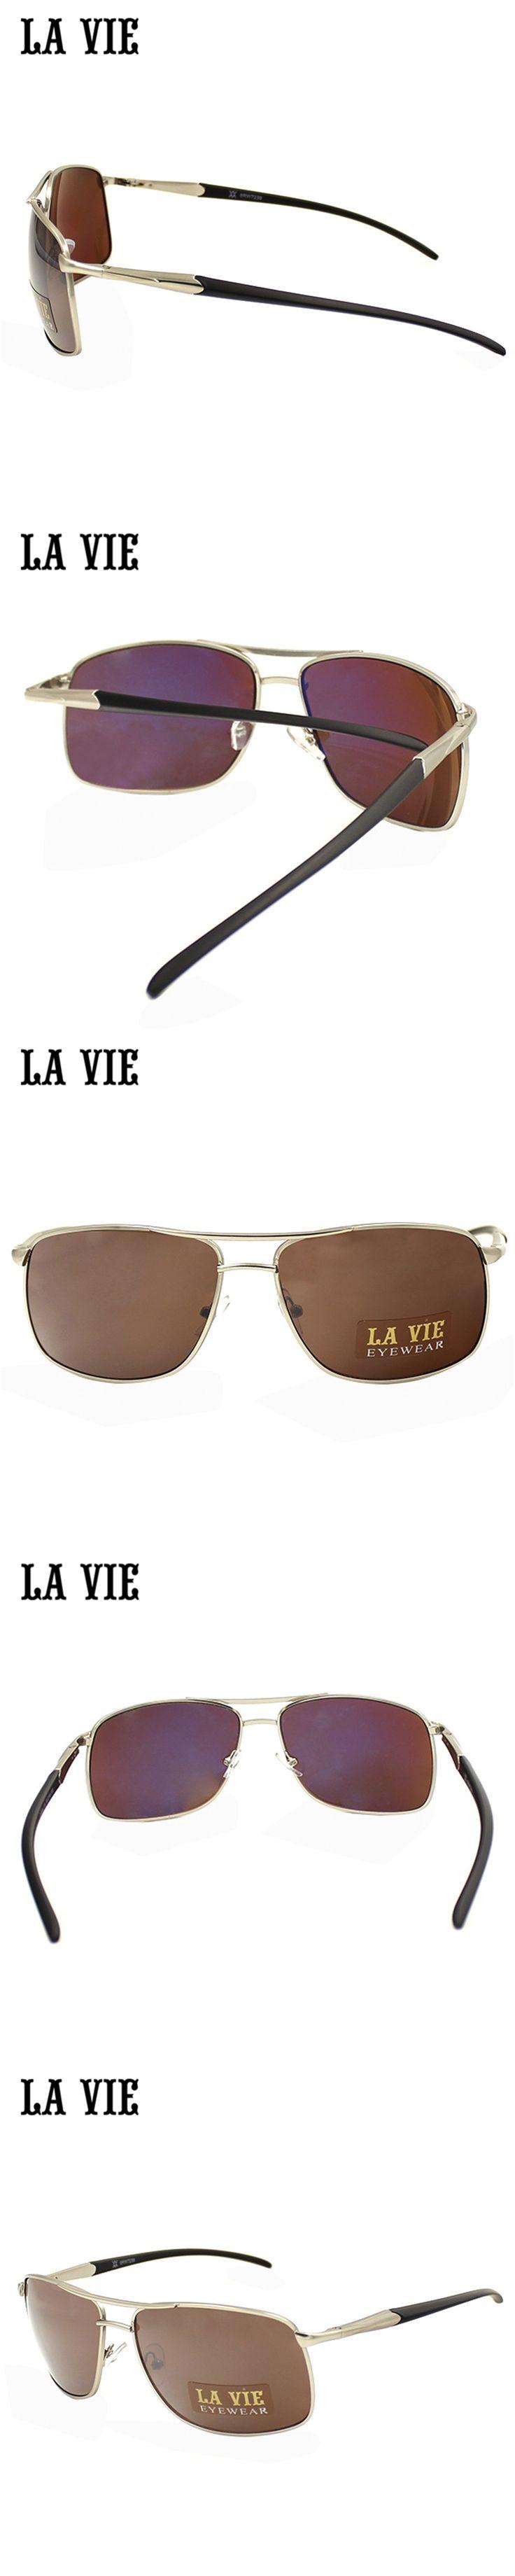 LA VIE 2016 New Fashionable Oval Sunglasses For Men Metal Sunglasses Brand Designer Gafas De Sol De Los Hombres UV400 #8RW7239